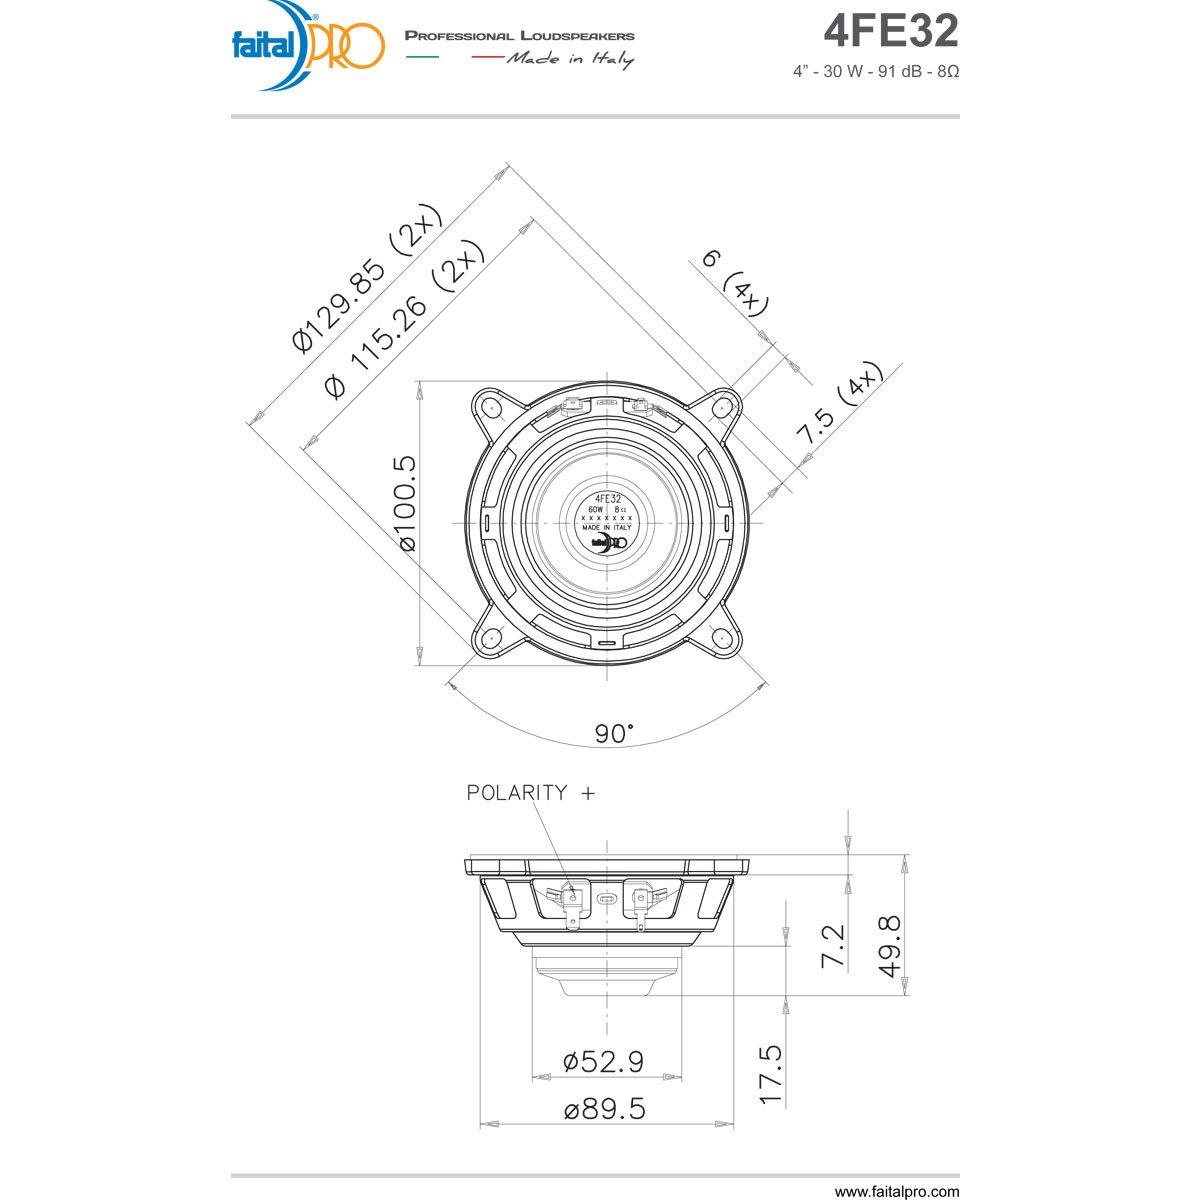 Pair Faital Pro 4fe32 4 Neodymium Full Range Linearray Line Array Speaker Wiring Diagram Woofer 8ohm 60w Home Audio Theater